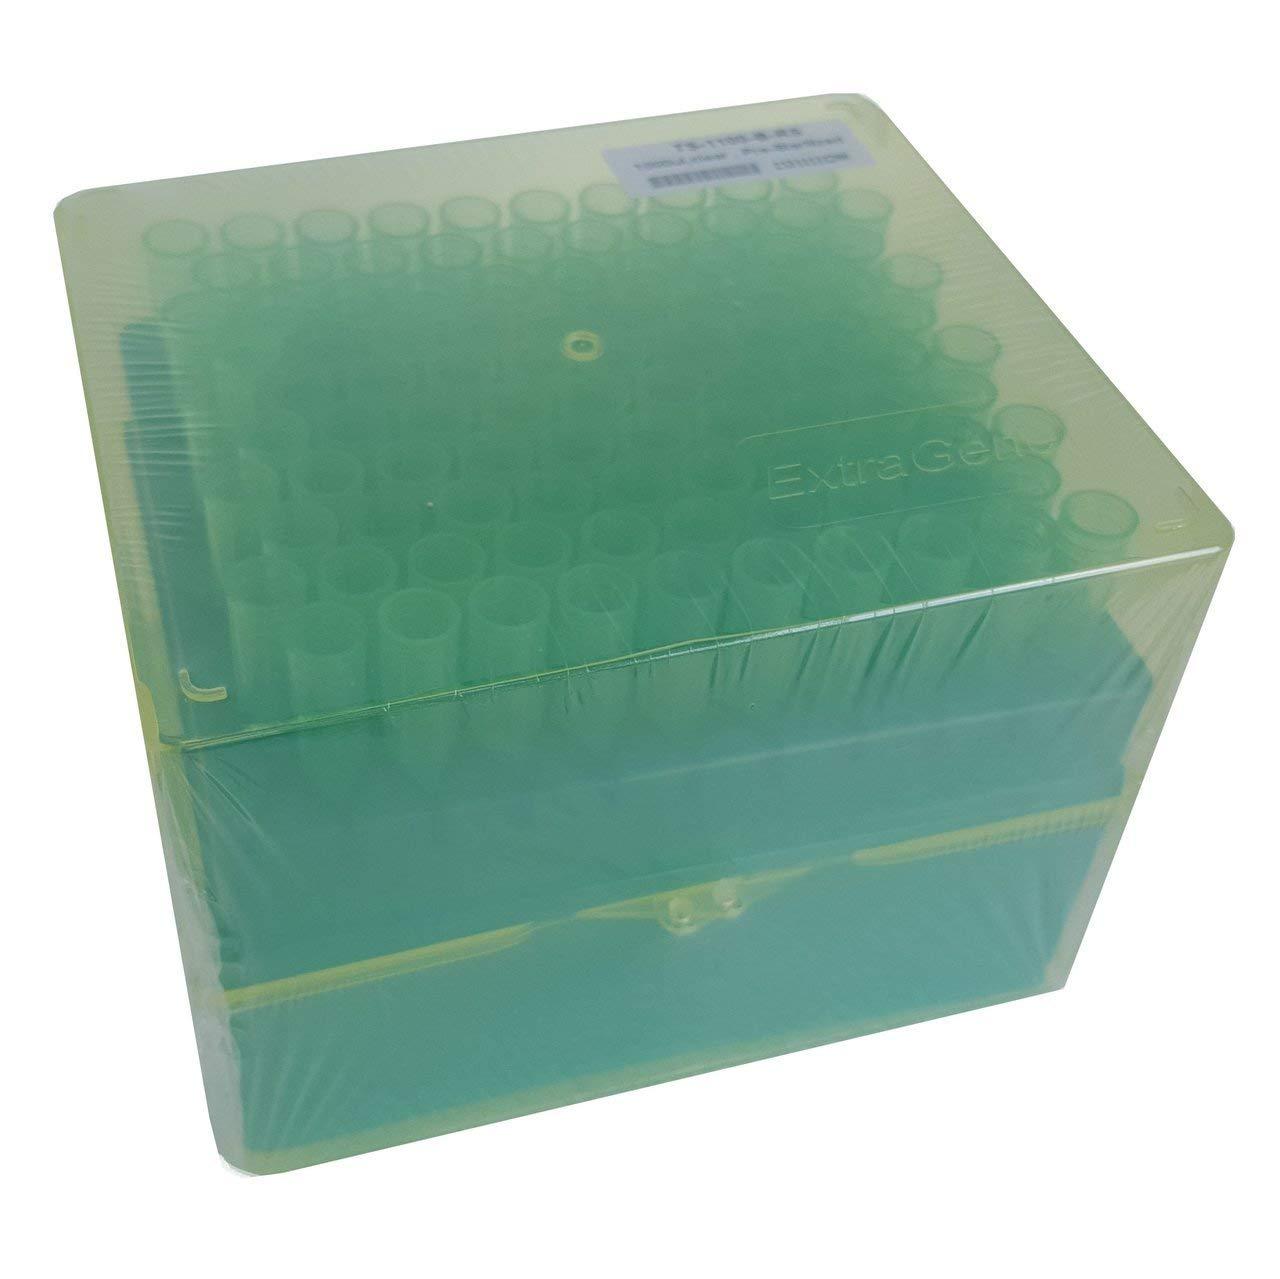 Extragene universal pipette tips 1000 ul, sterile DNase/RNase  autoclavable, racked 96 tips/rack, pk x 10 racks (960 tips)